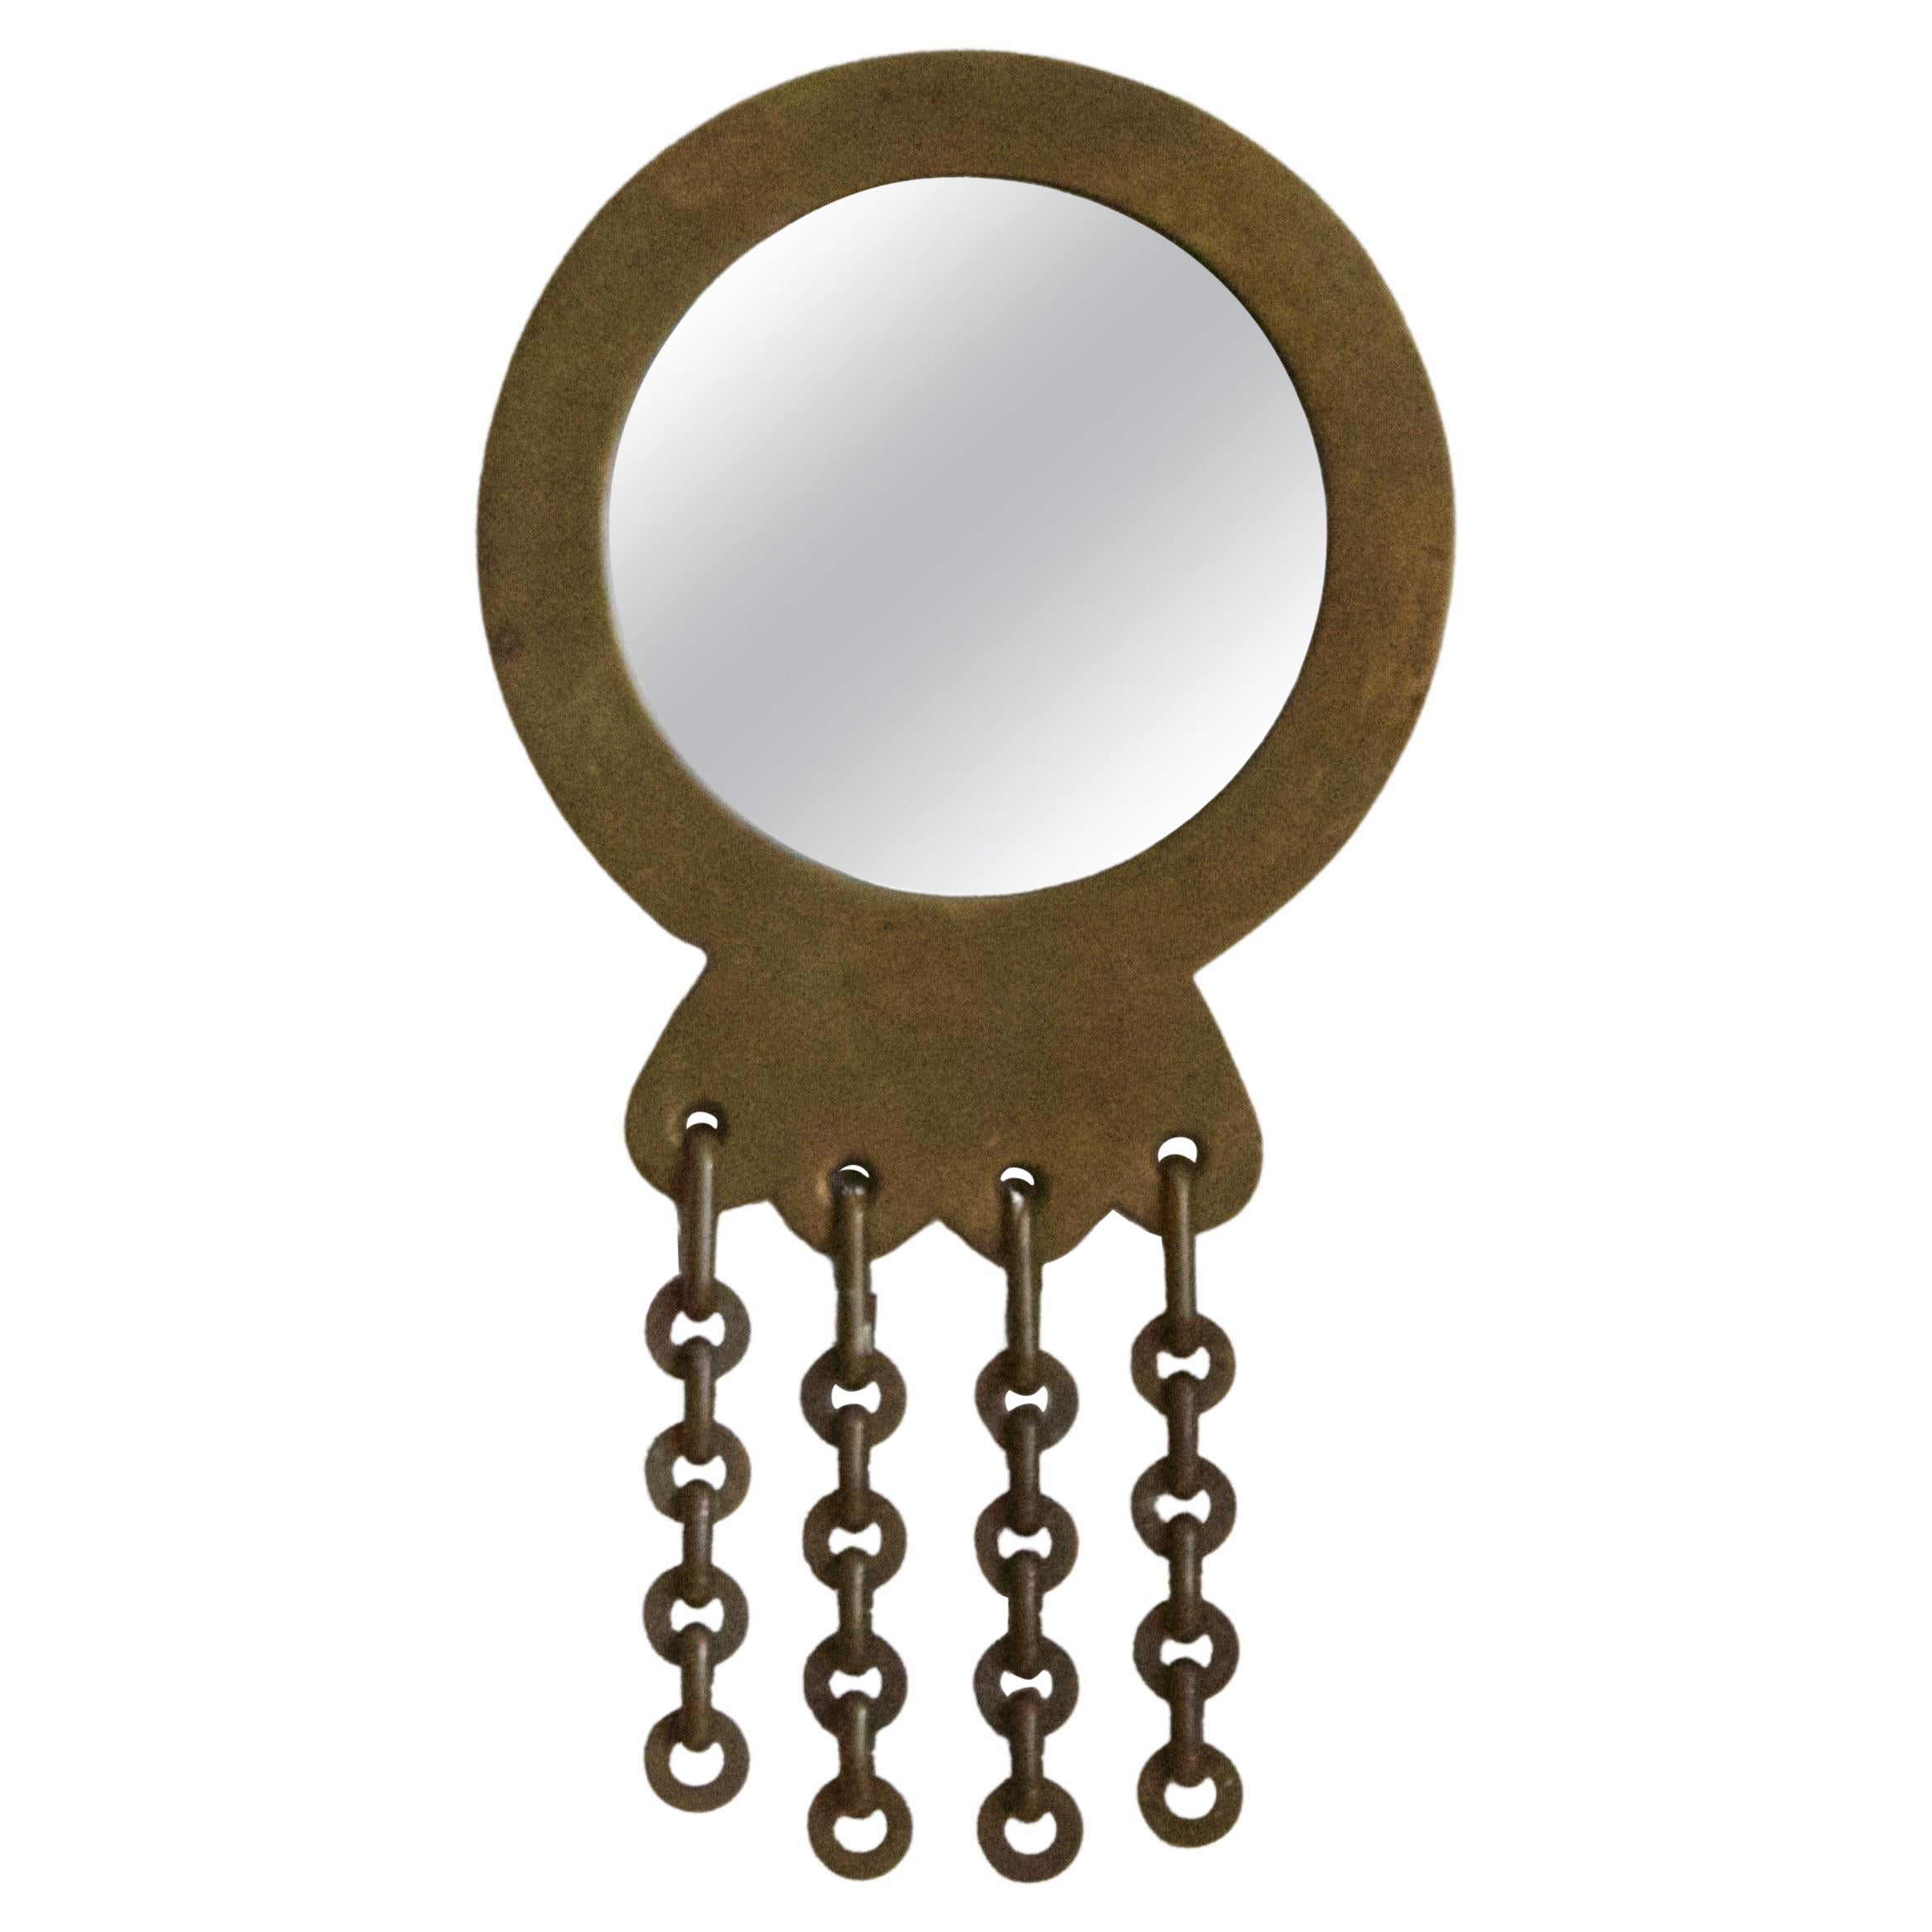 Italian, Small Wall Mirror, Brass, Mirror Glass, Italy, 1940s